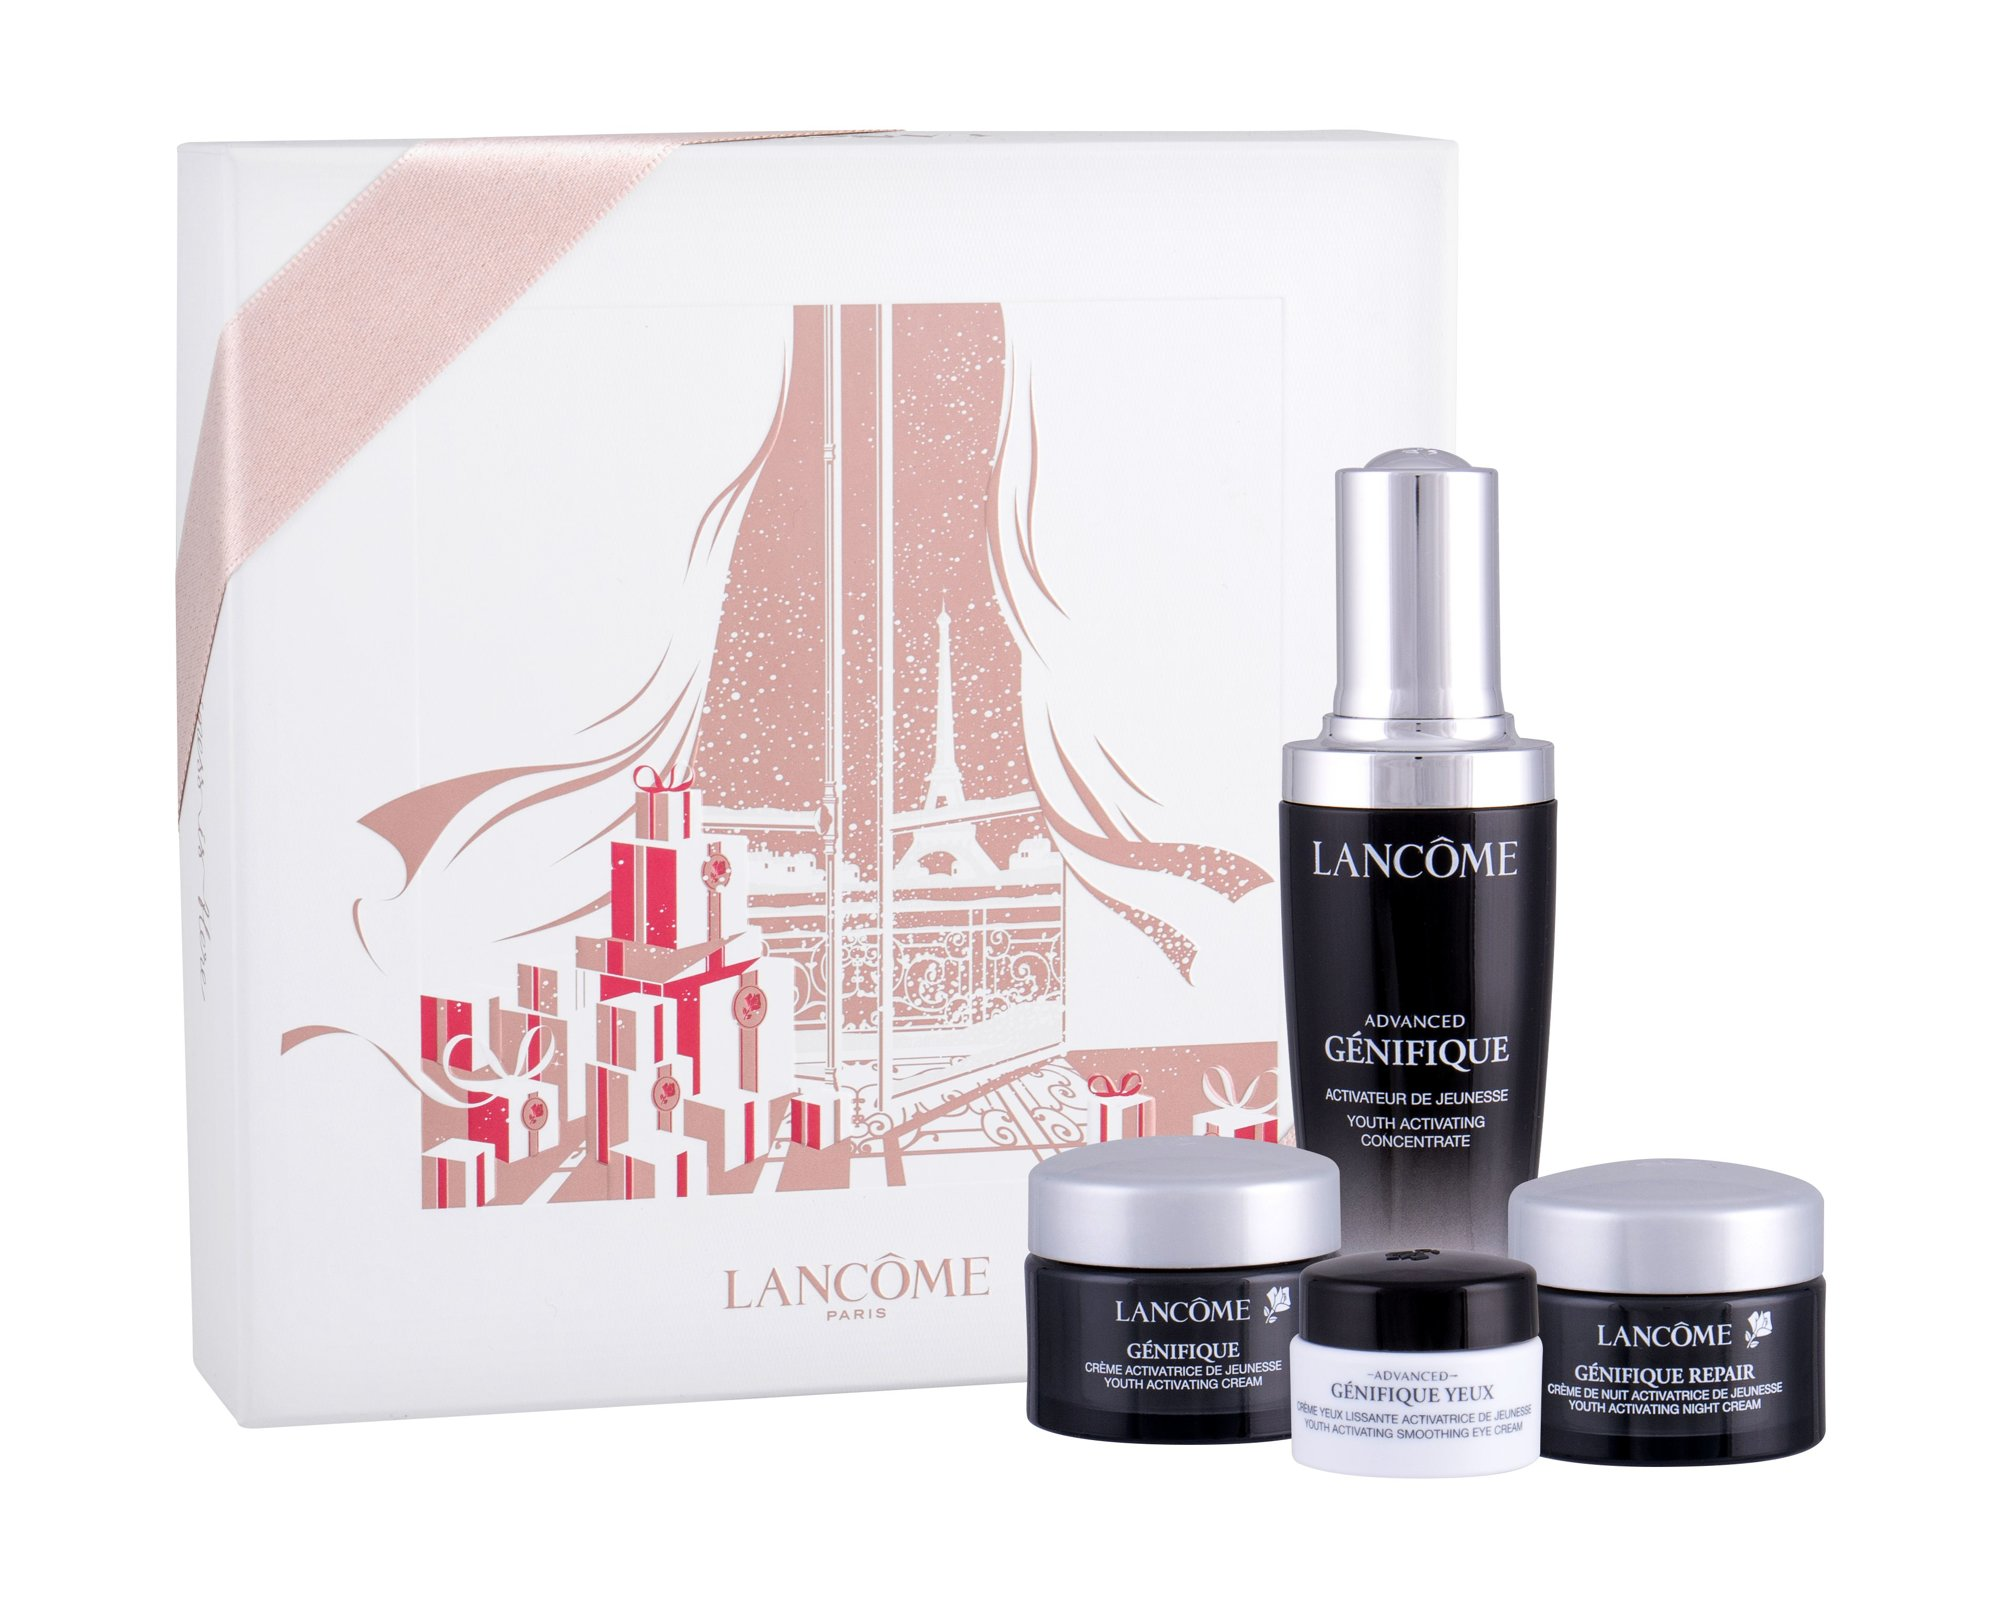 Lancôme Advanced Génifique Skin Serum 50ml